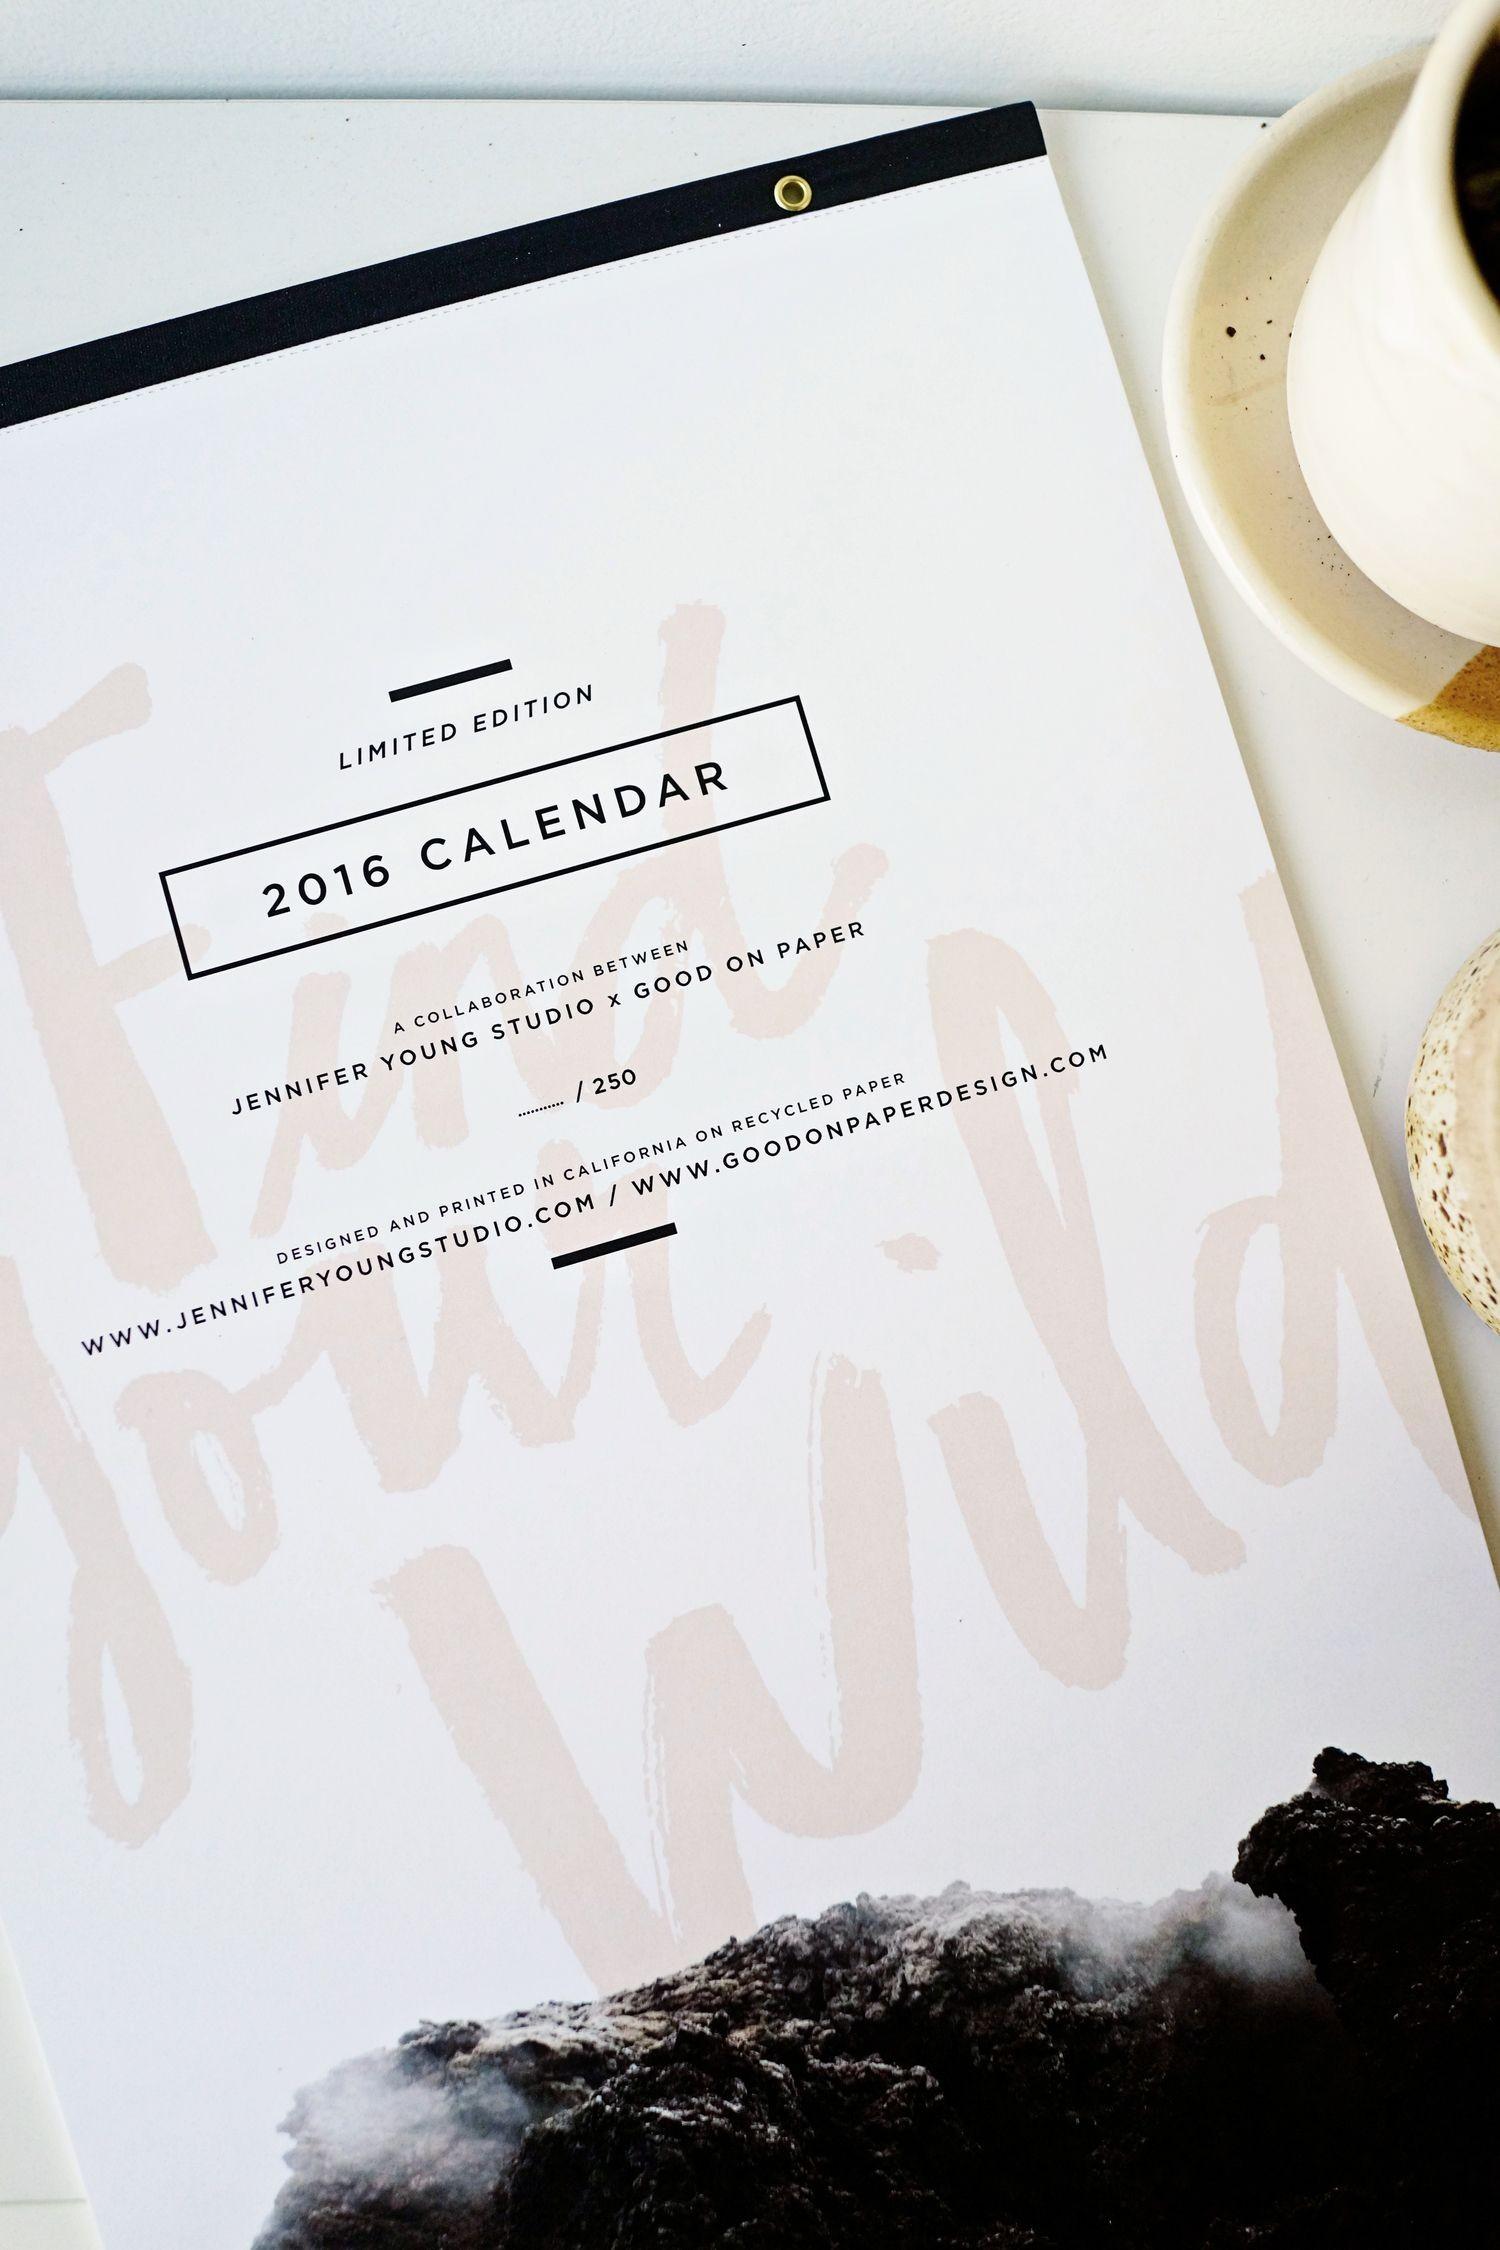 Calendario Imprimir Semanas Más Recientes 2016 Calendar by Jennifer Young X Good On Paper Of Calendario Imprimir Semanas Más Reciente Calendario Académico